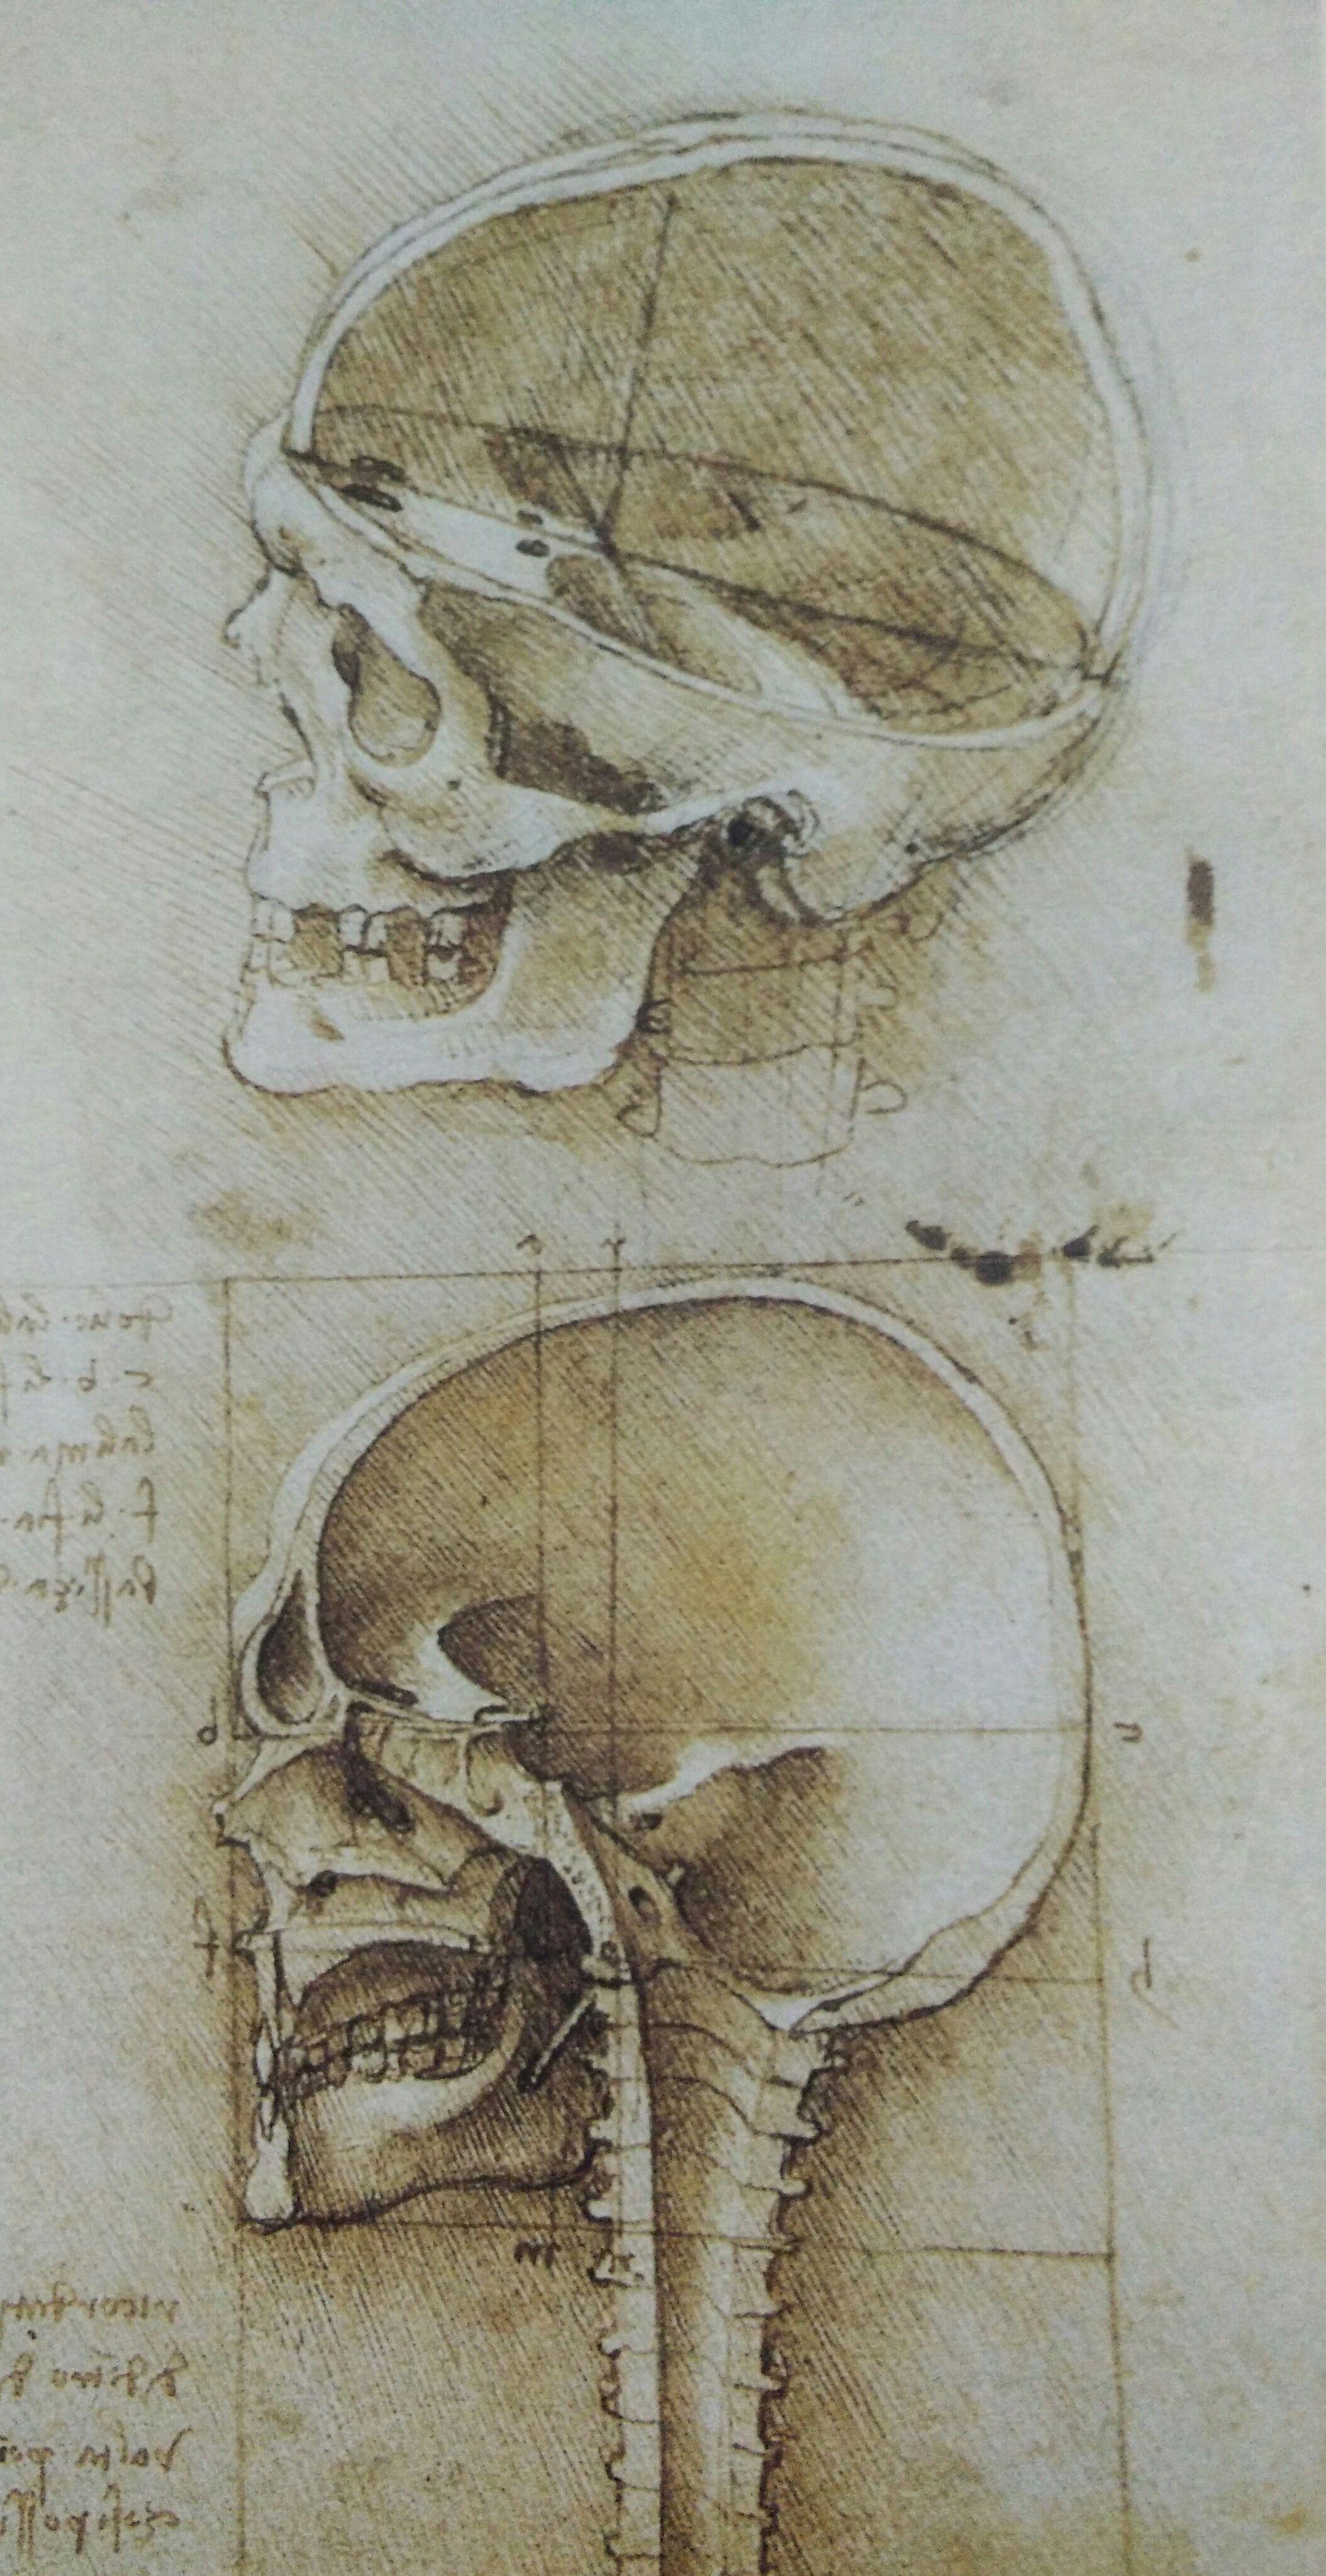 Leonardo da vinci portrait drawing 13g 21084095 collage leonardo da vinci on portrait drawing anatomy master class toneelgroepblik Choice Image